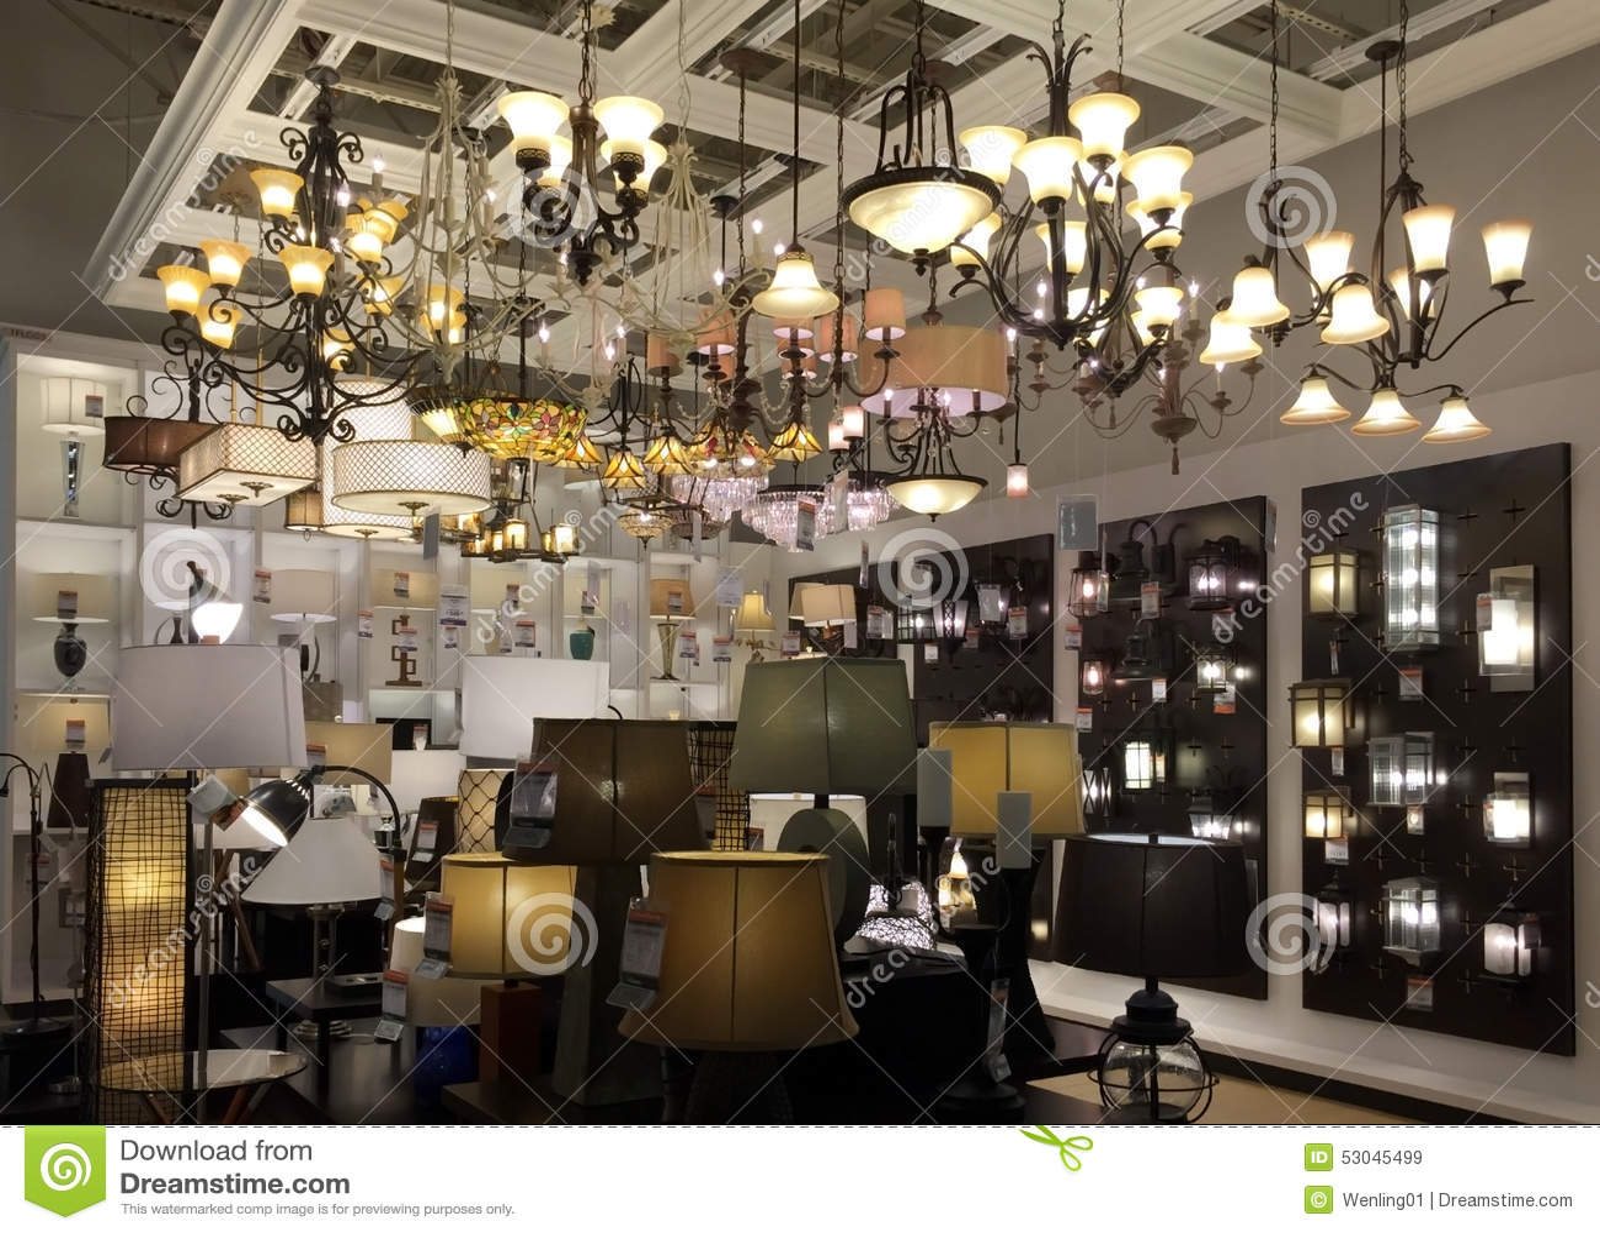 Light fixtures selling at furniture market background